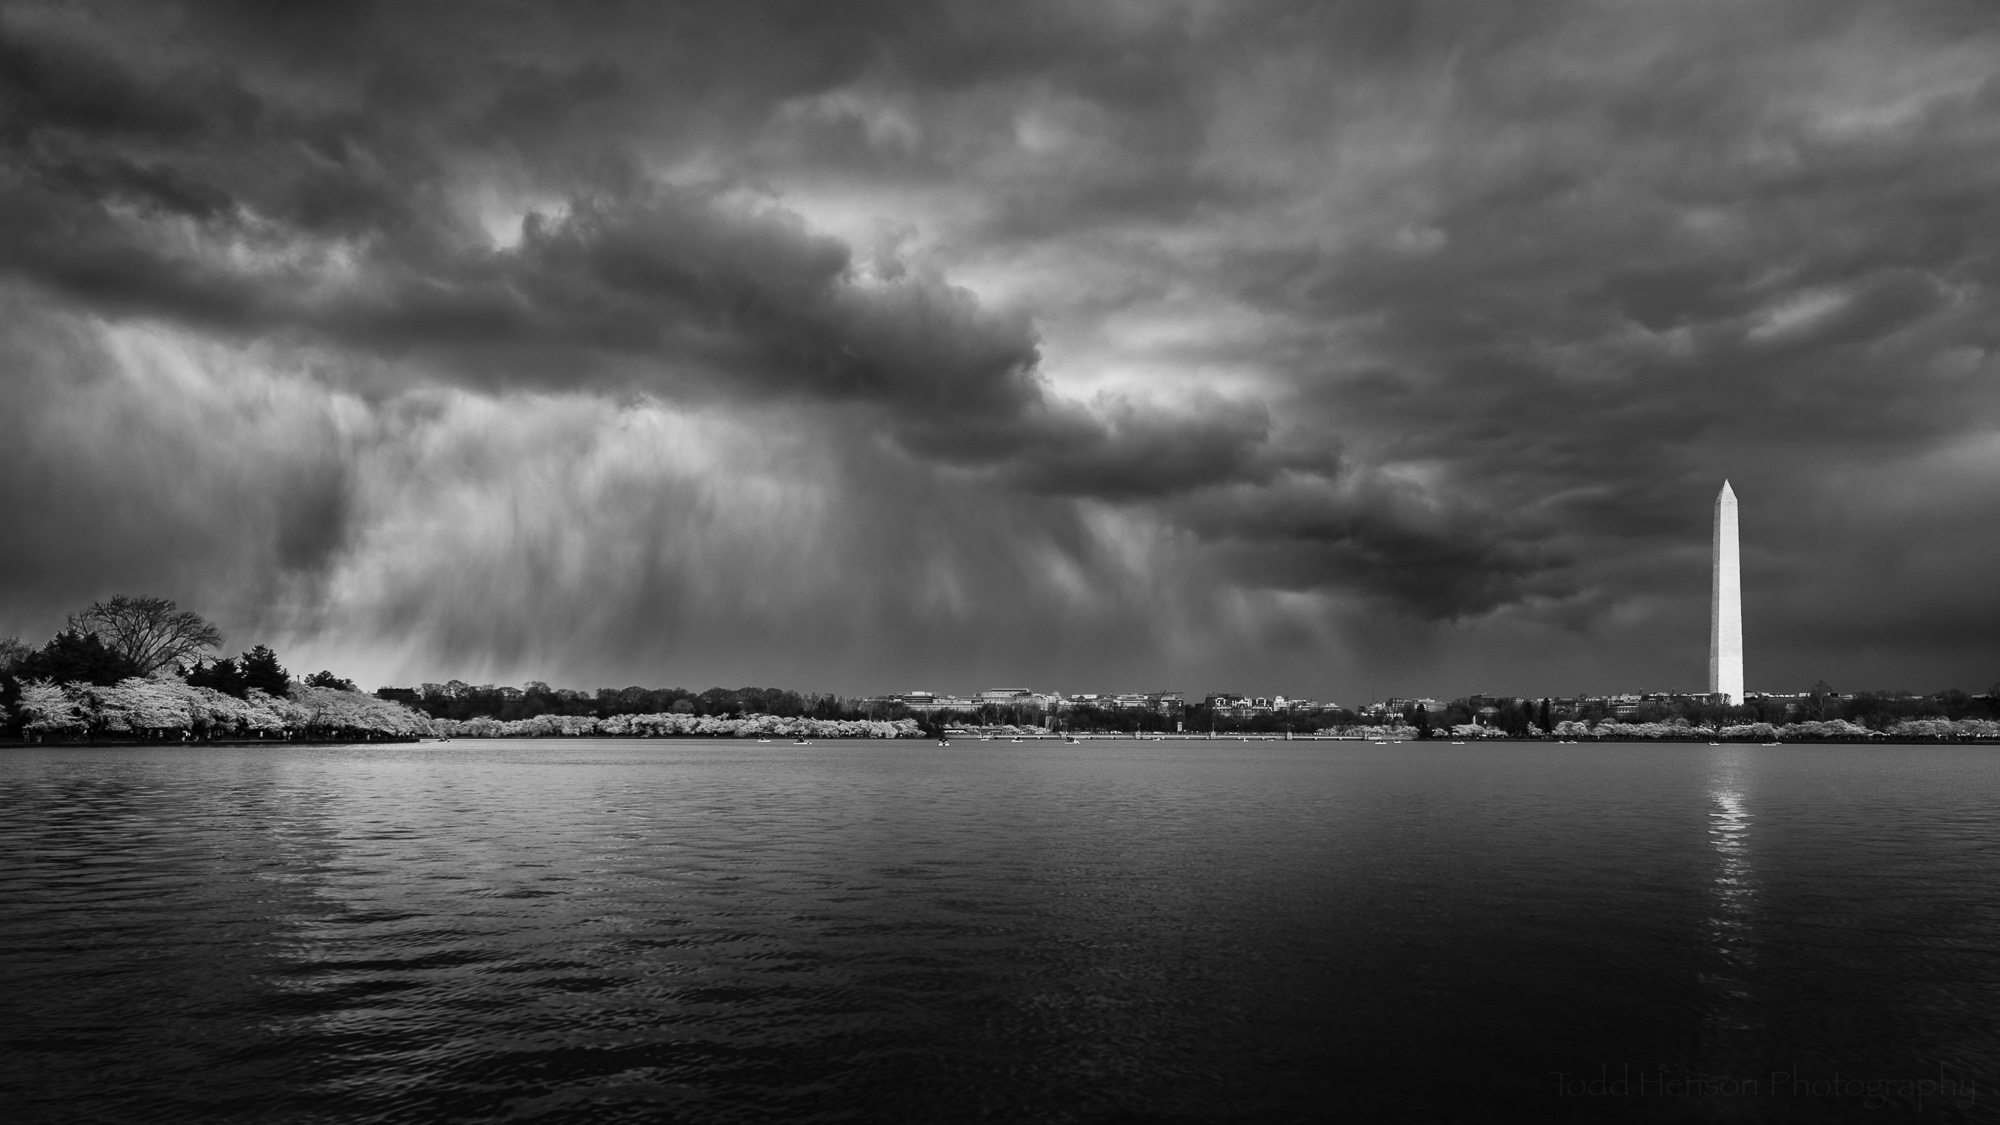 Storm over Washington